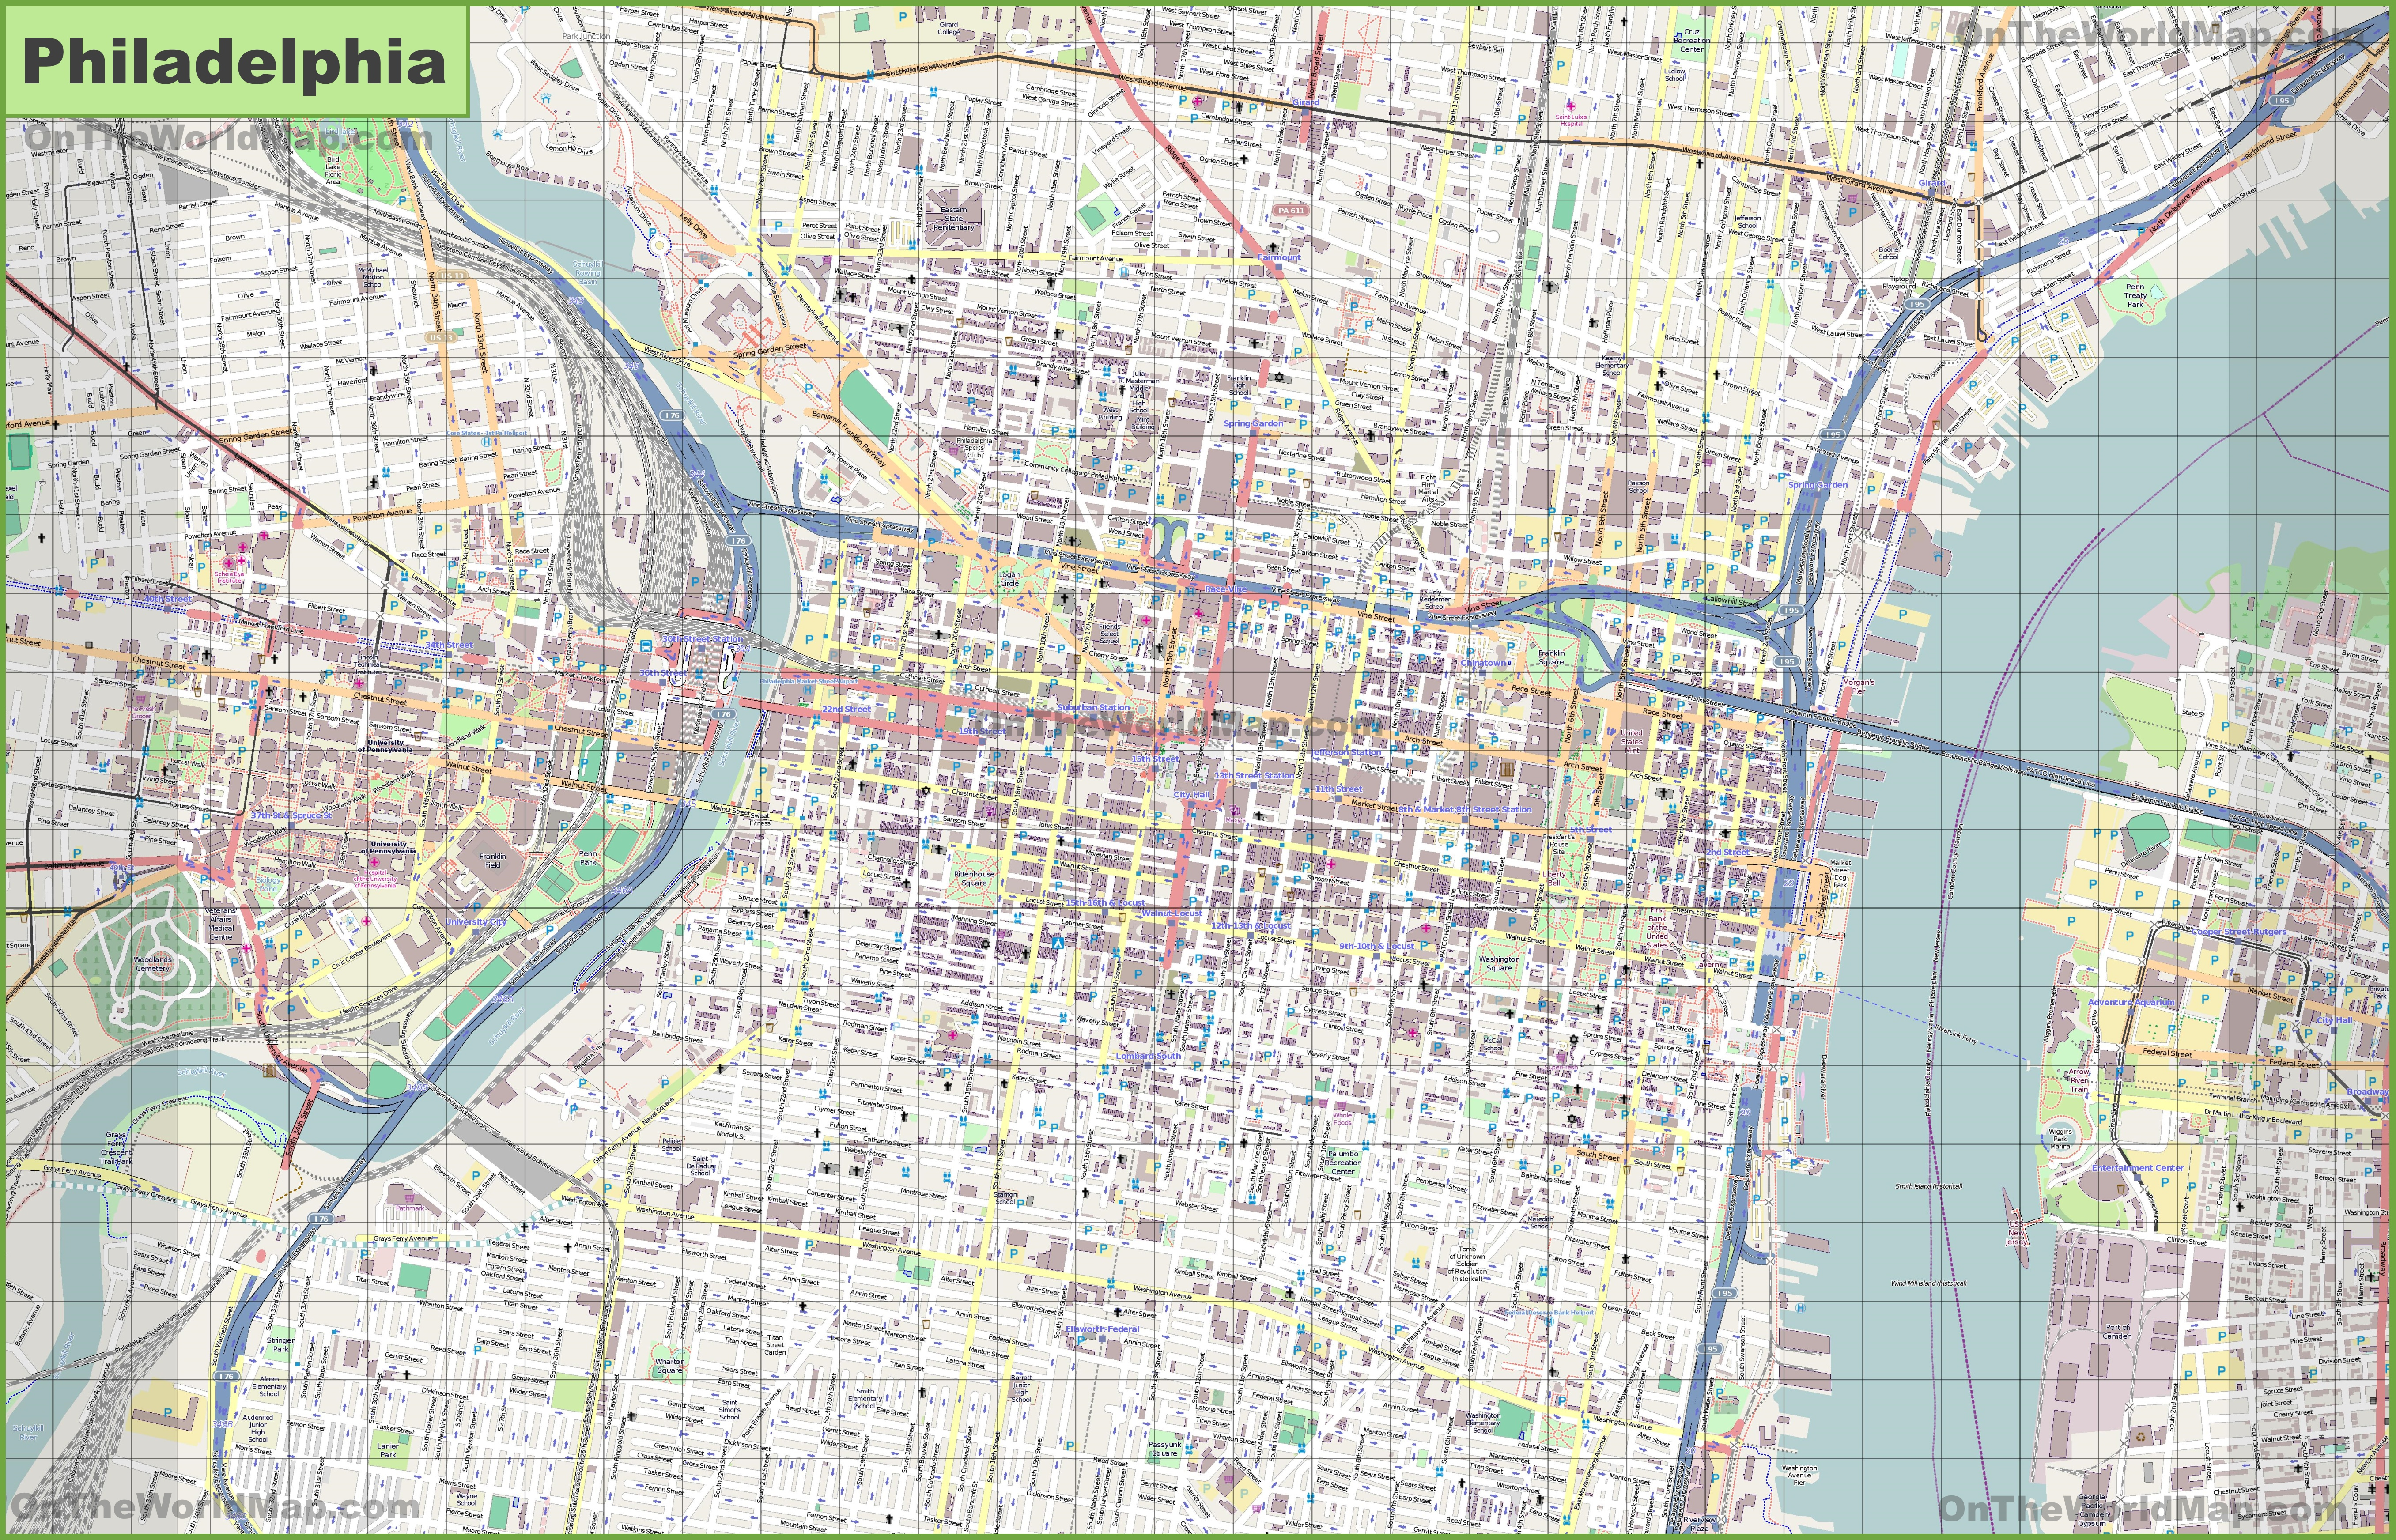 Large Detailed Street Map Of Philadelphia - Printable Map Of Philadelphia